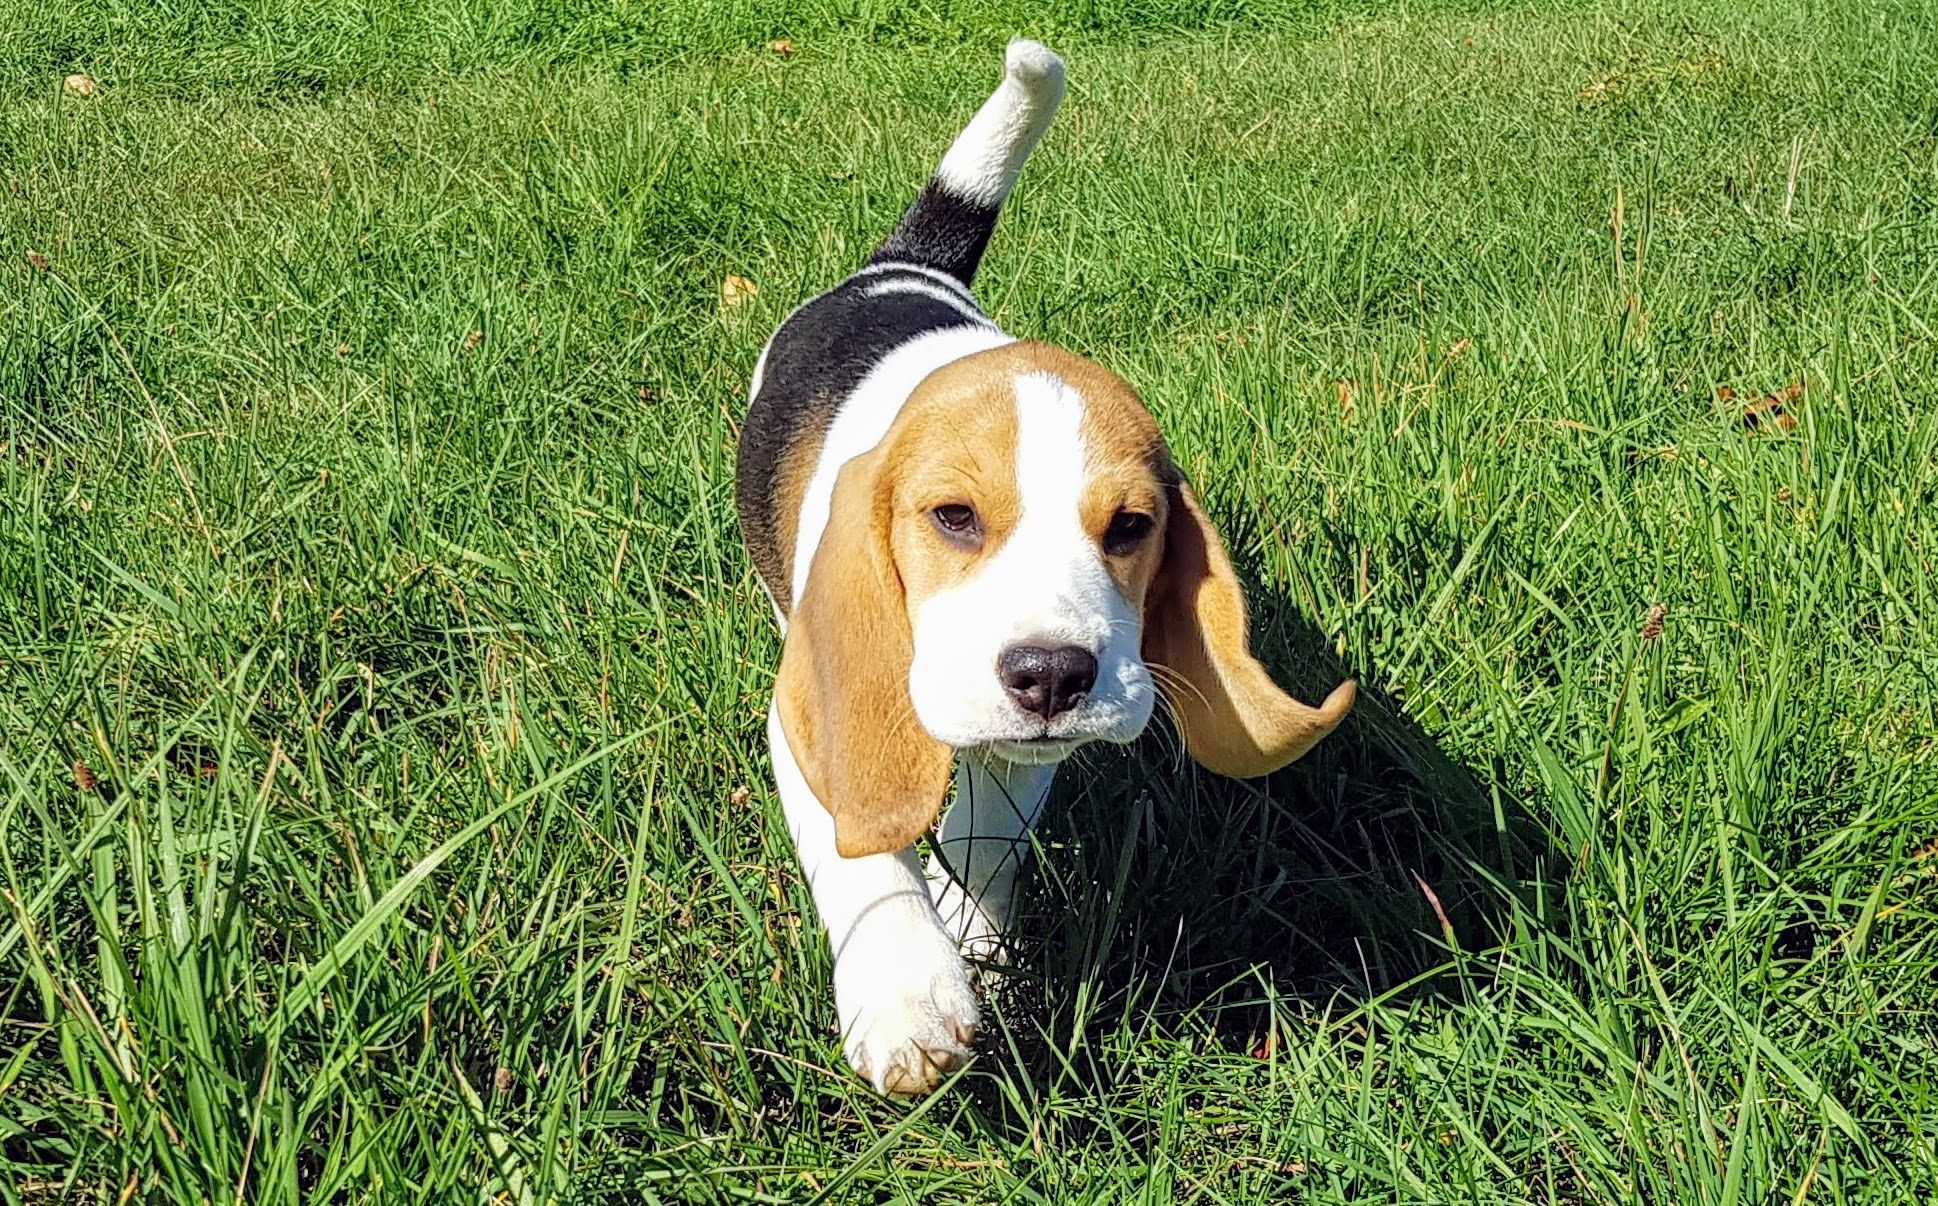 Big Ears Puppy Puppies Beagle Corgi